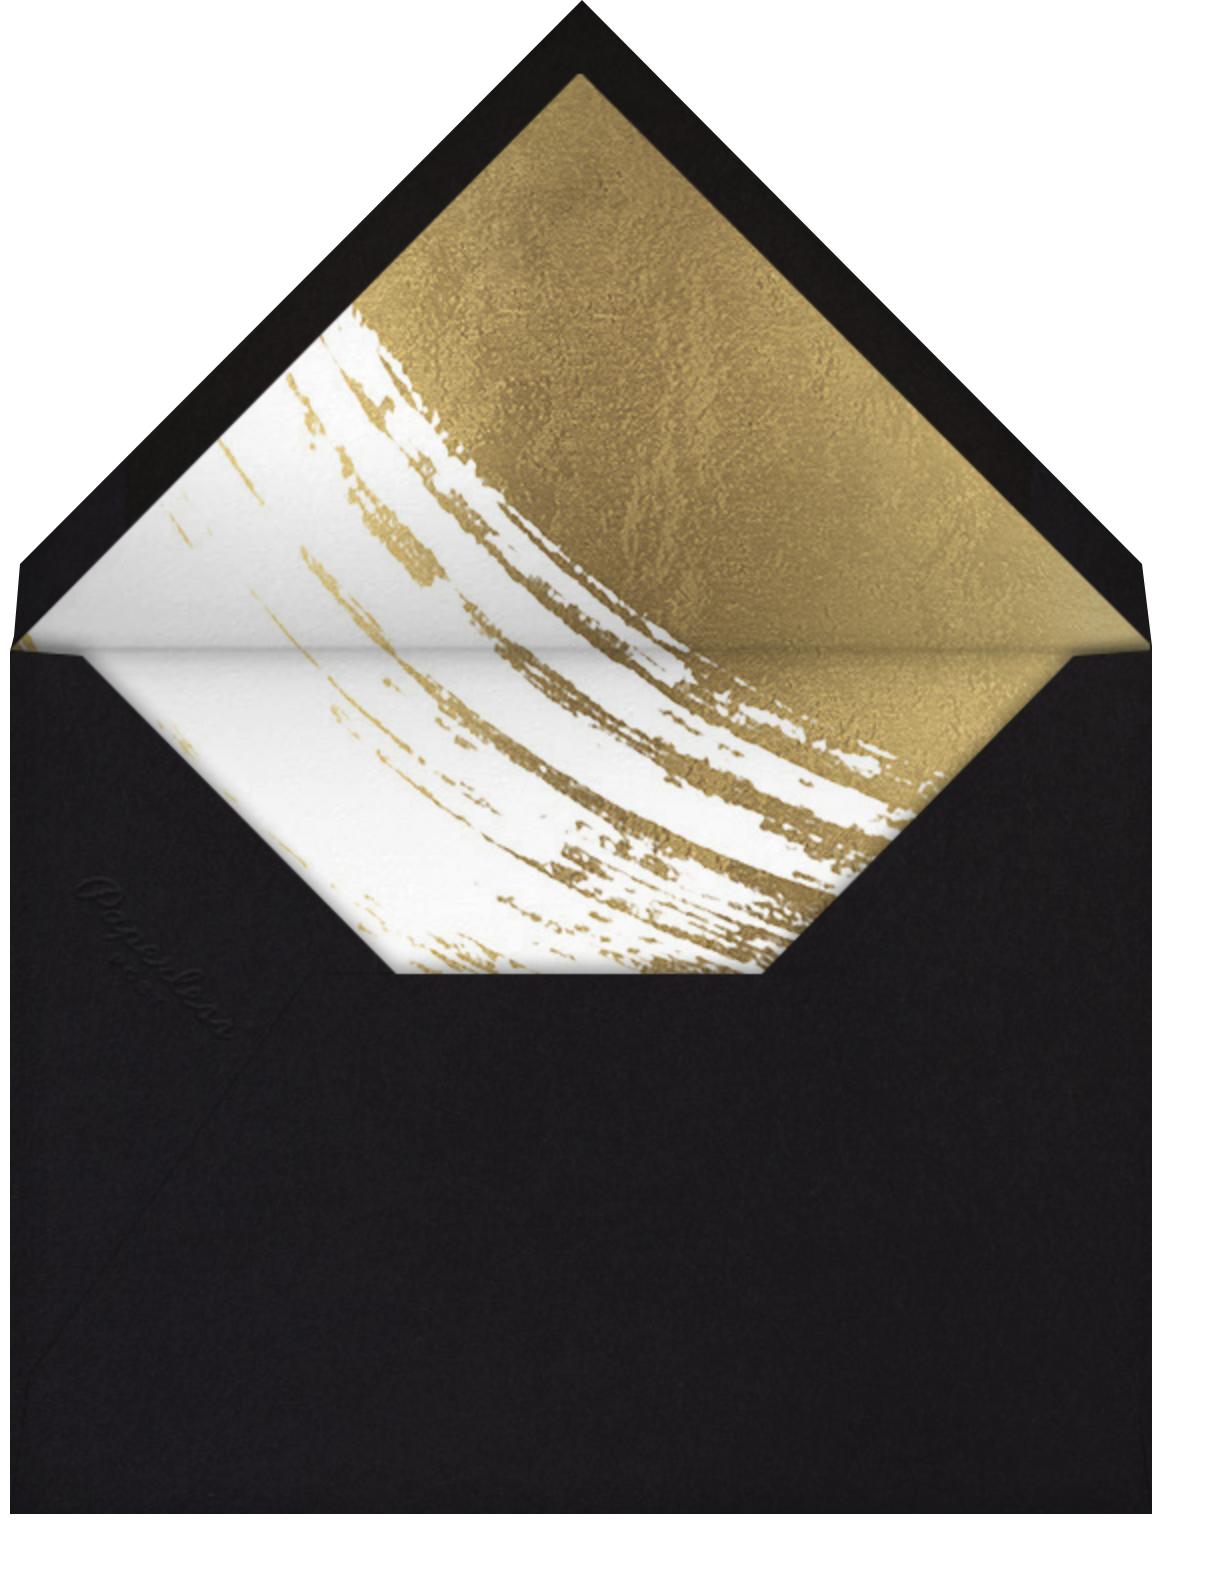 Impasto - Paperless Post - Milestone  - envelope back